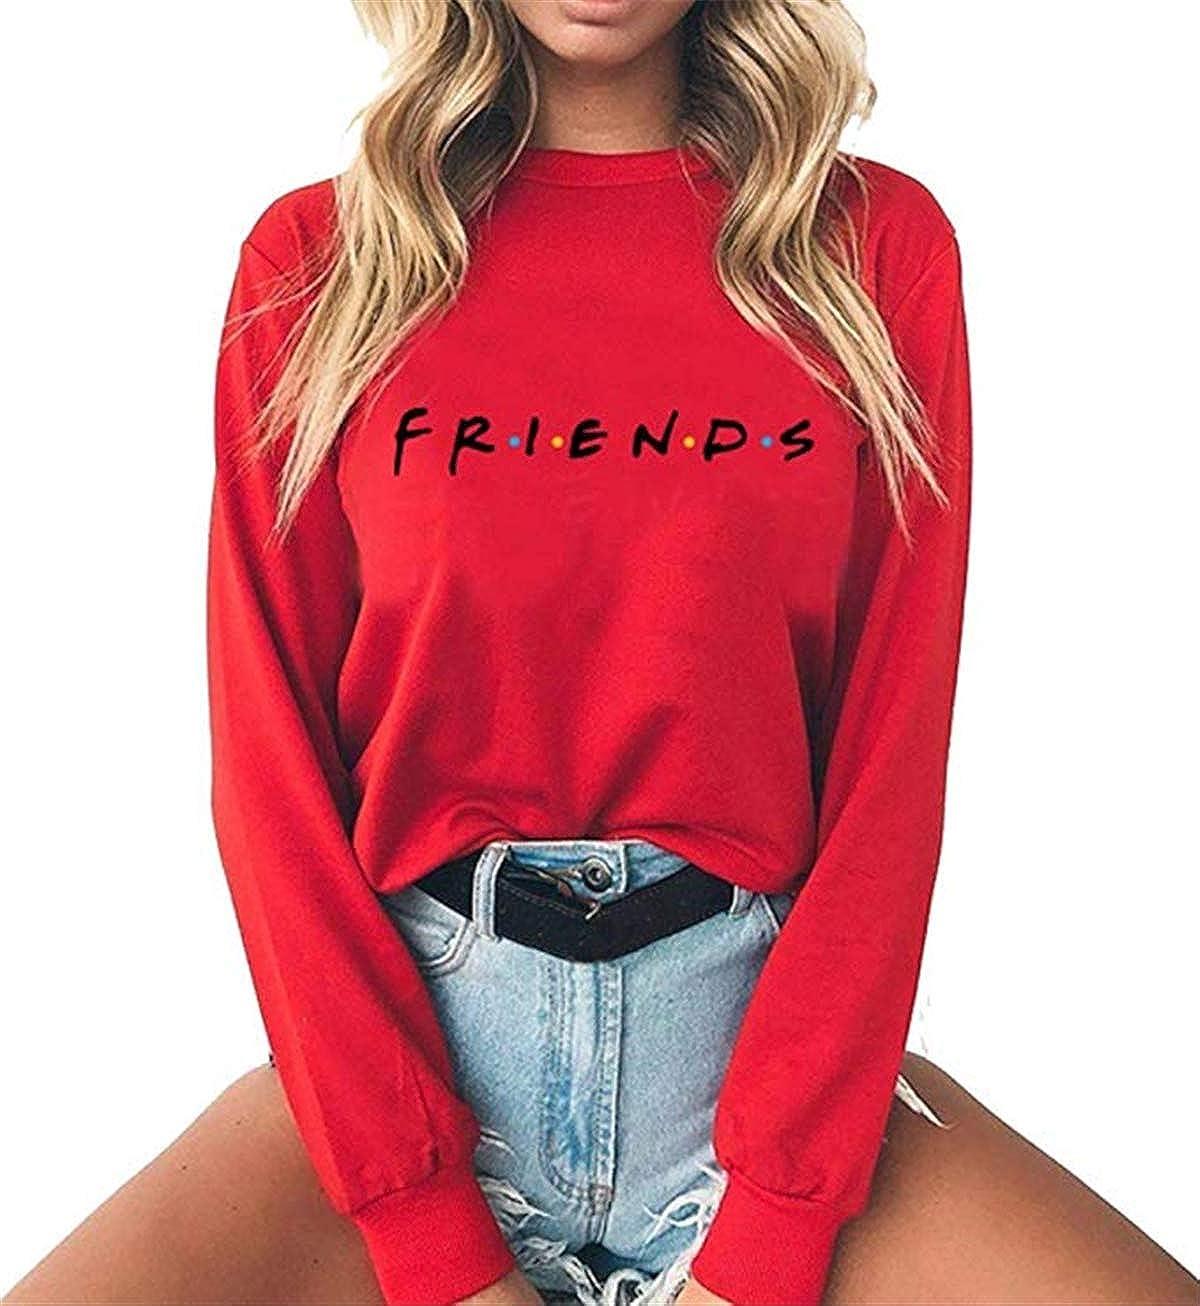 Baby Room Women's Casual Friends Printed Long Sleeve Pullover Sweatshirt